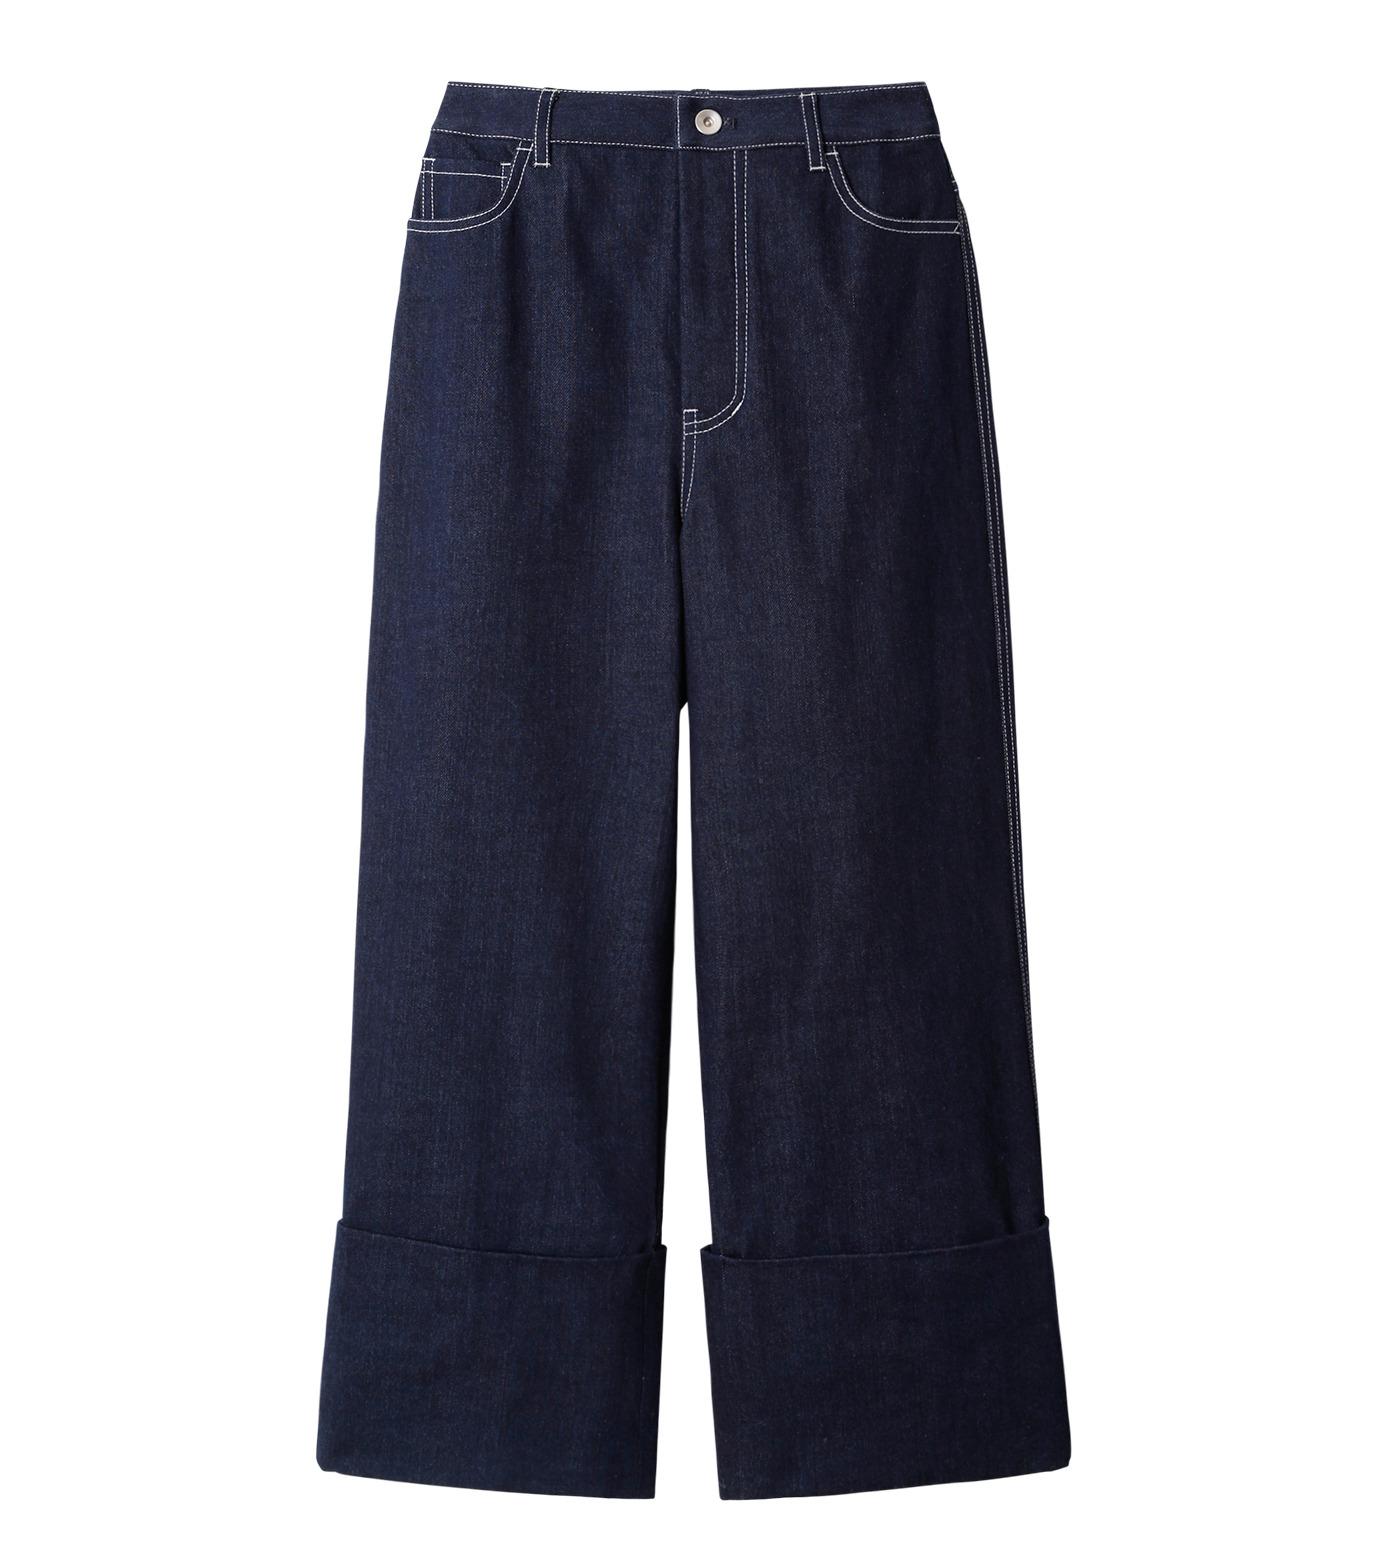 LE CIEL BLEU(ルシェルブルー)のデニムフォールドバックパンツ-INDIGO(パンツ/pants)-18A68304 拡大詳細画像4